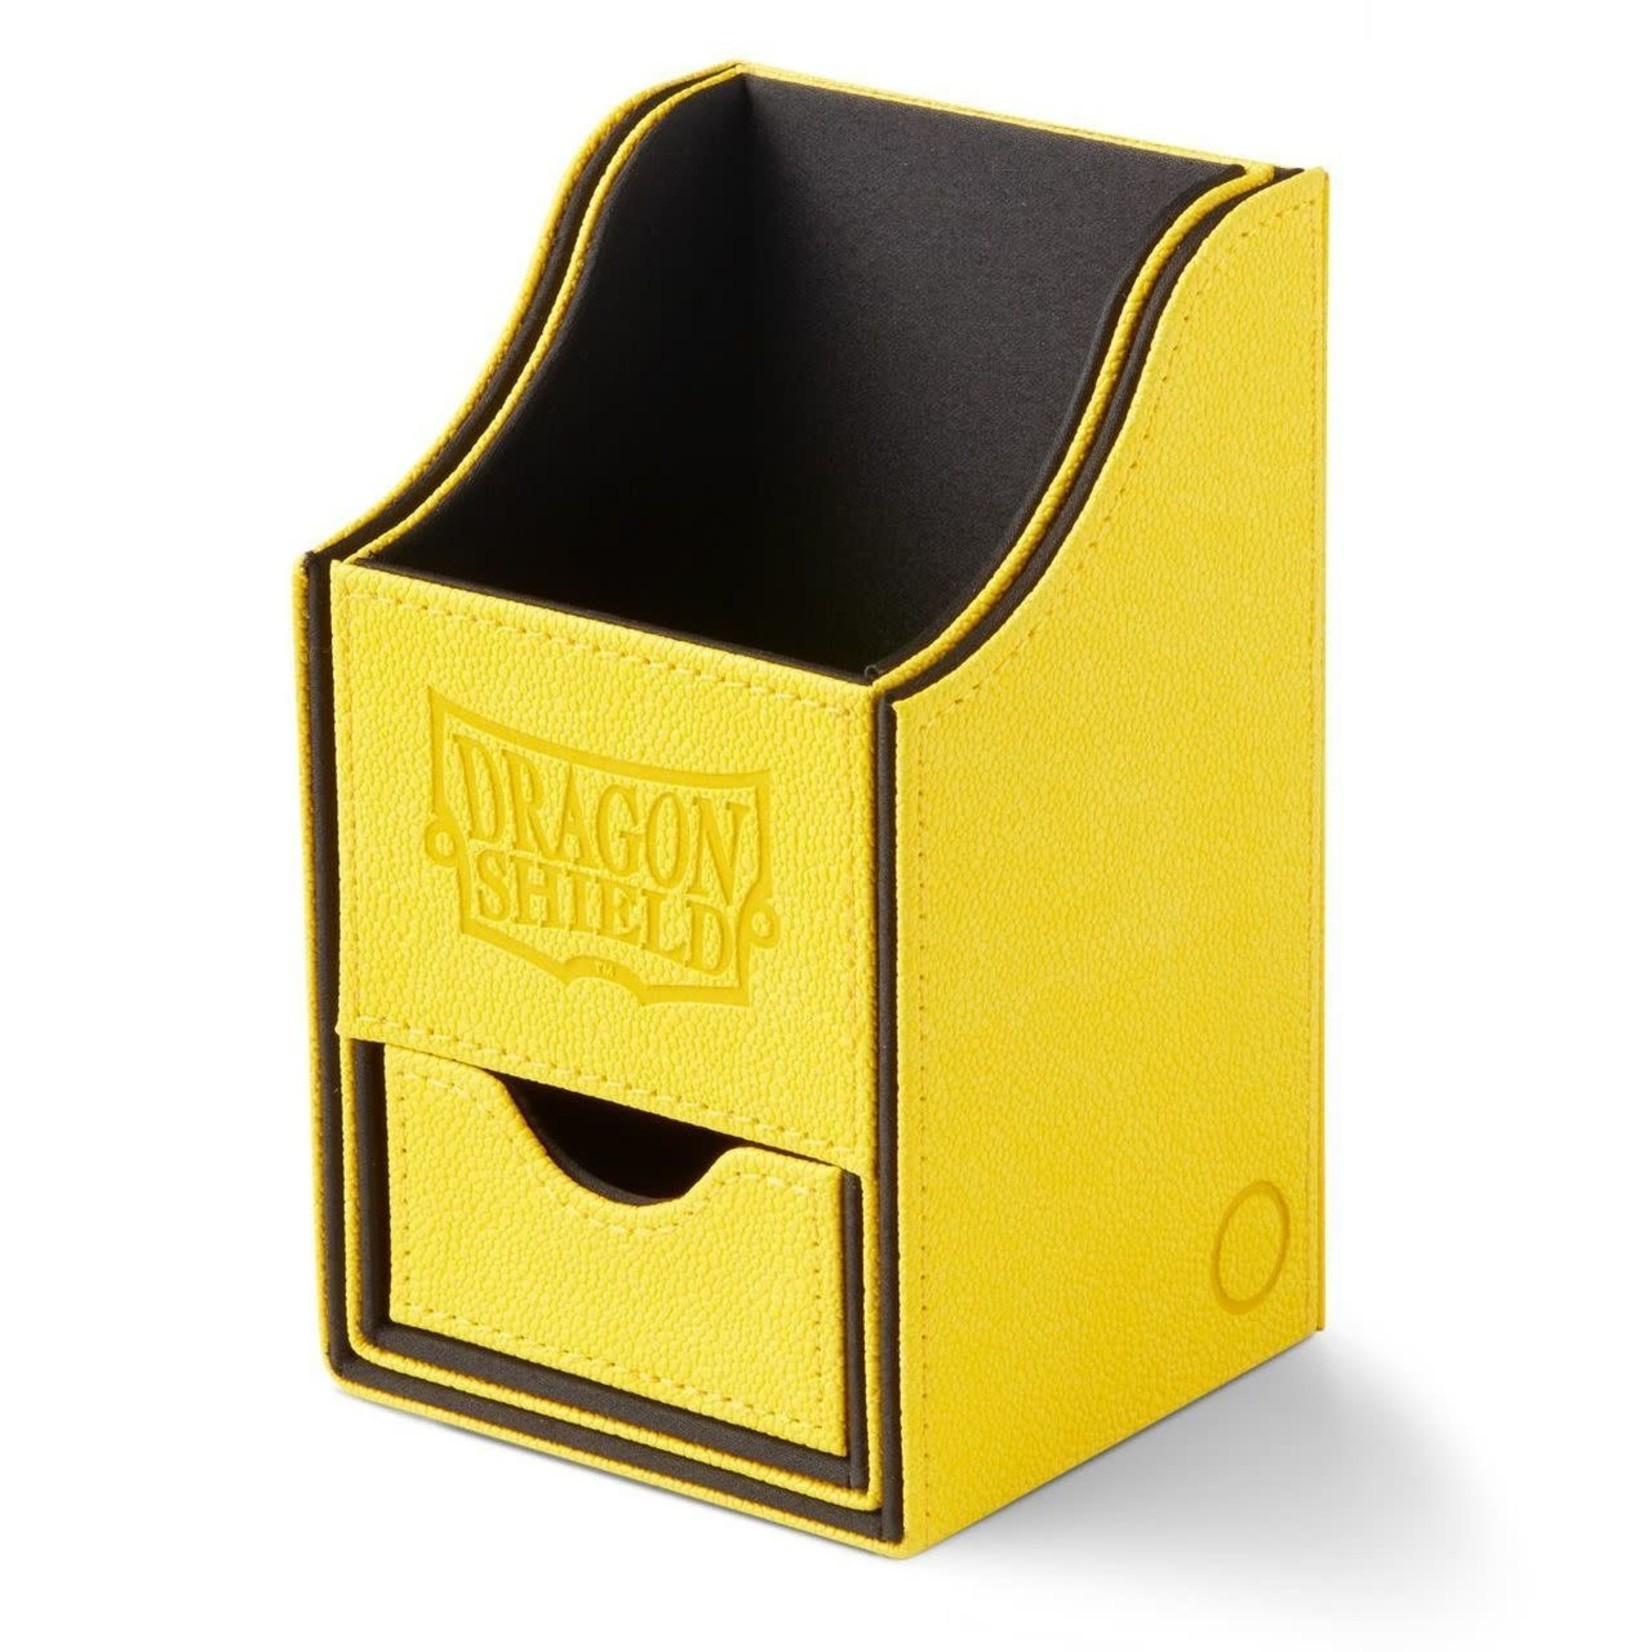 Arcane Tinman Dragon Shield Deckbox Nest w/ Tray - Yellow/Black